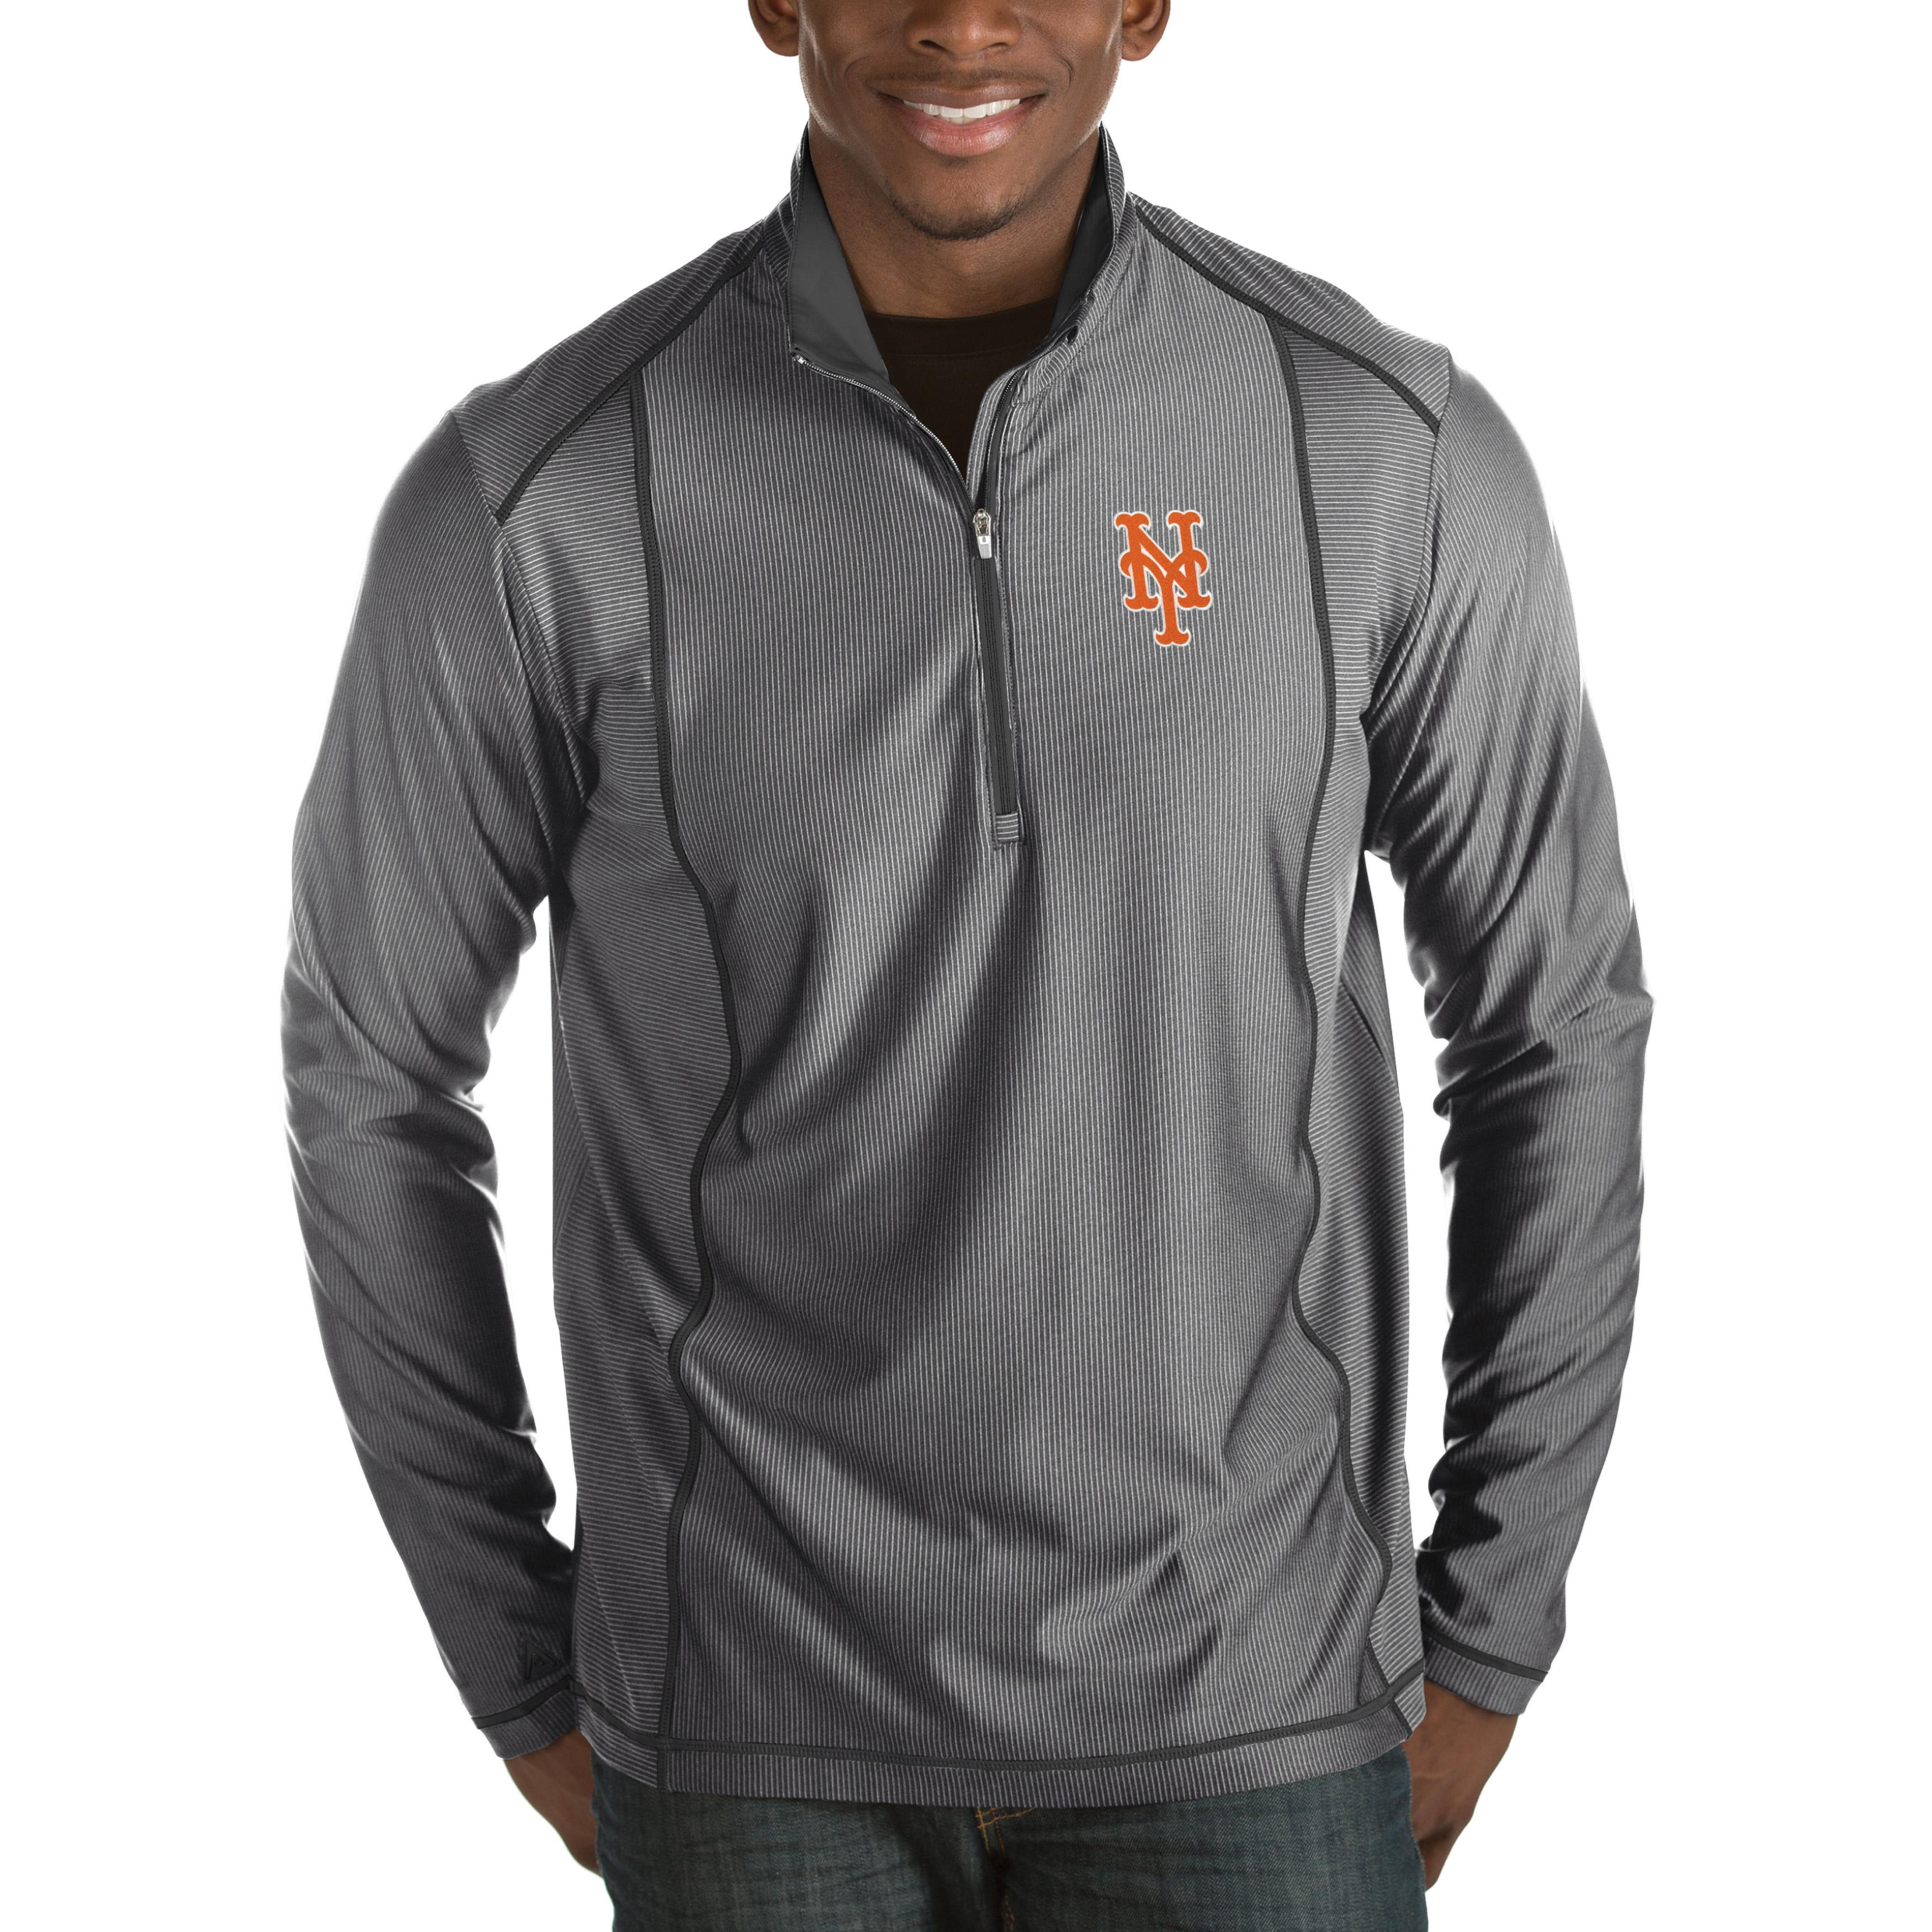 New York Mets Antigua Tempo Half-Zip Pullover Jacket - Heathered Charcoal